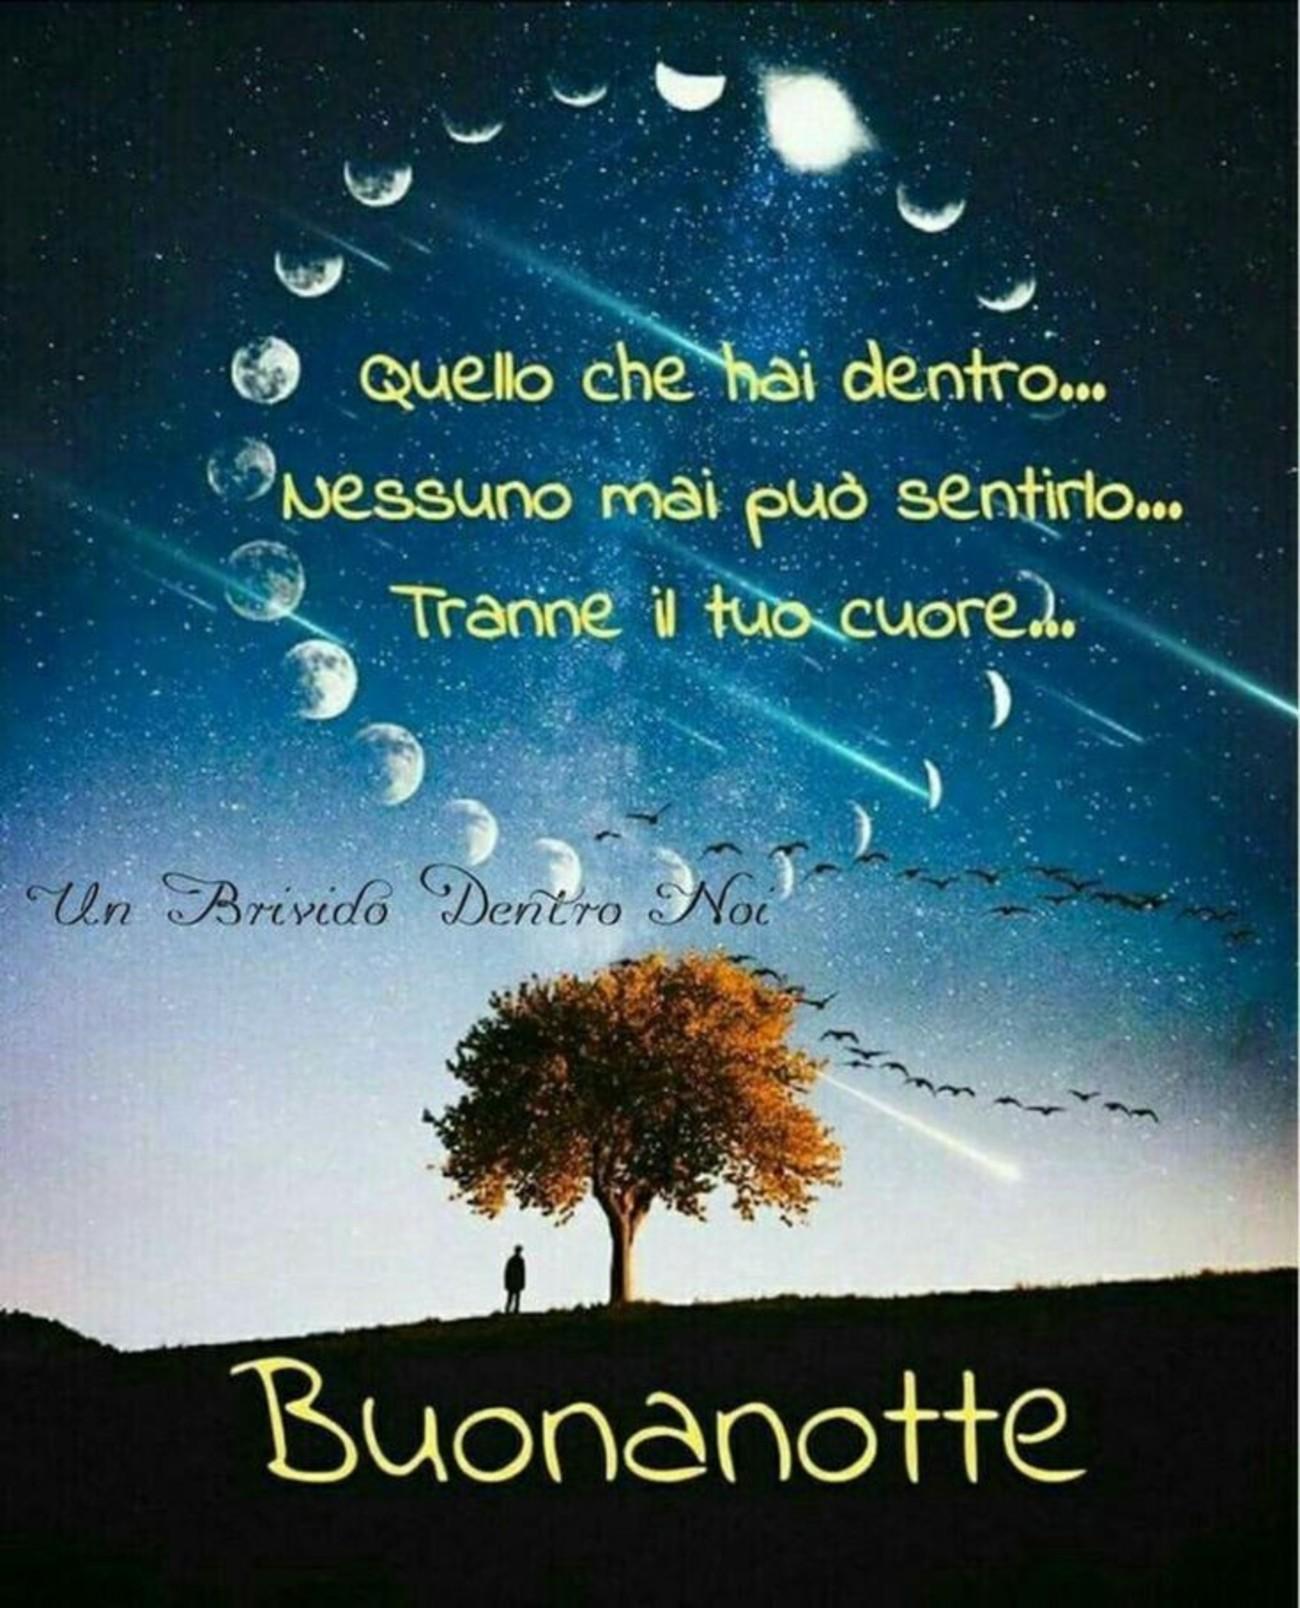 Immagini gratis buonanotte (2)